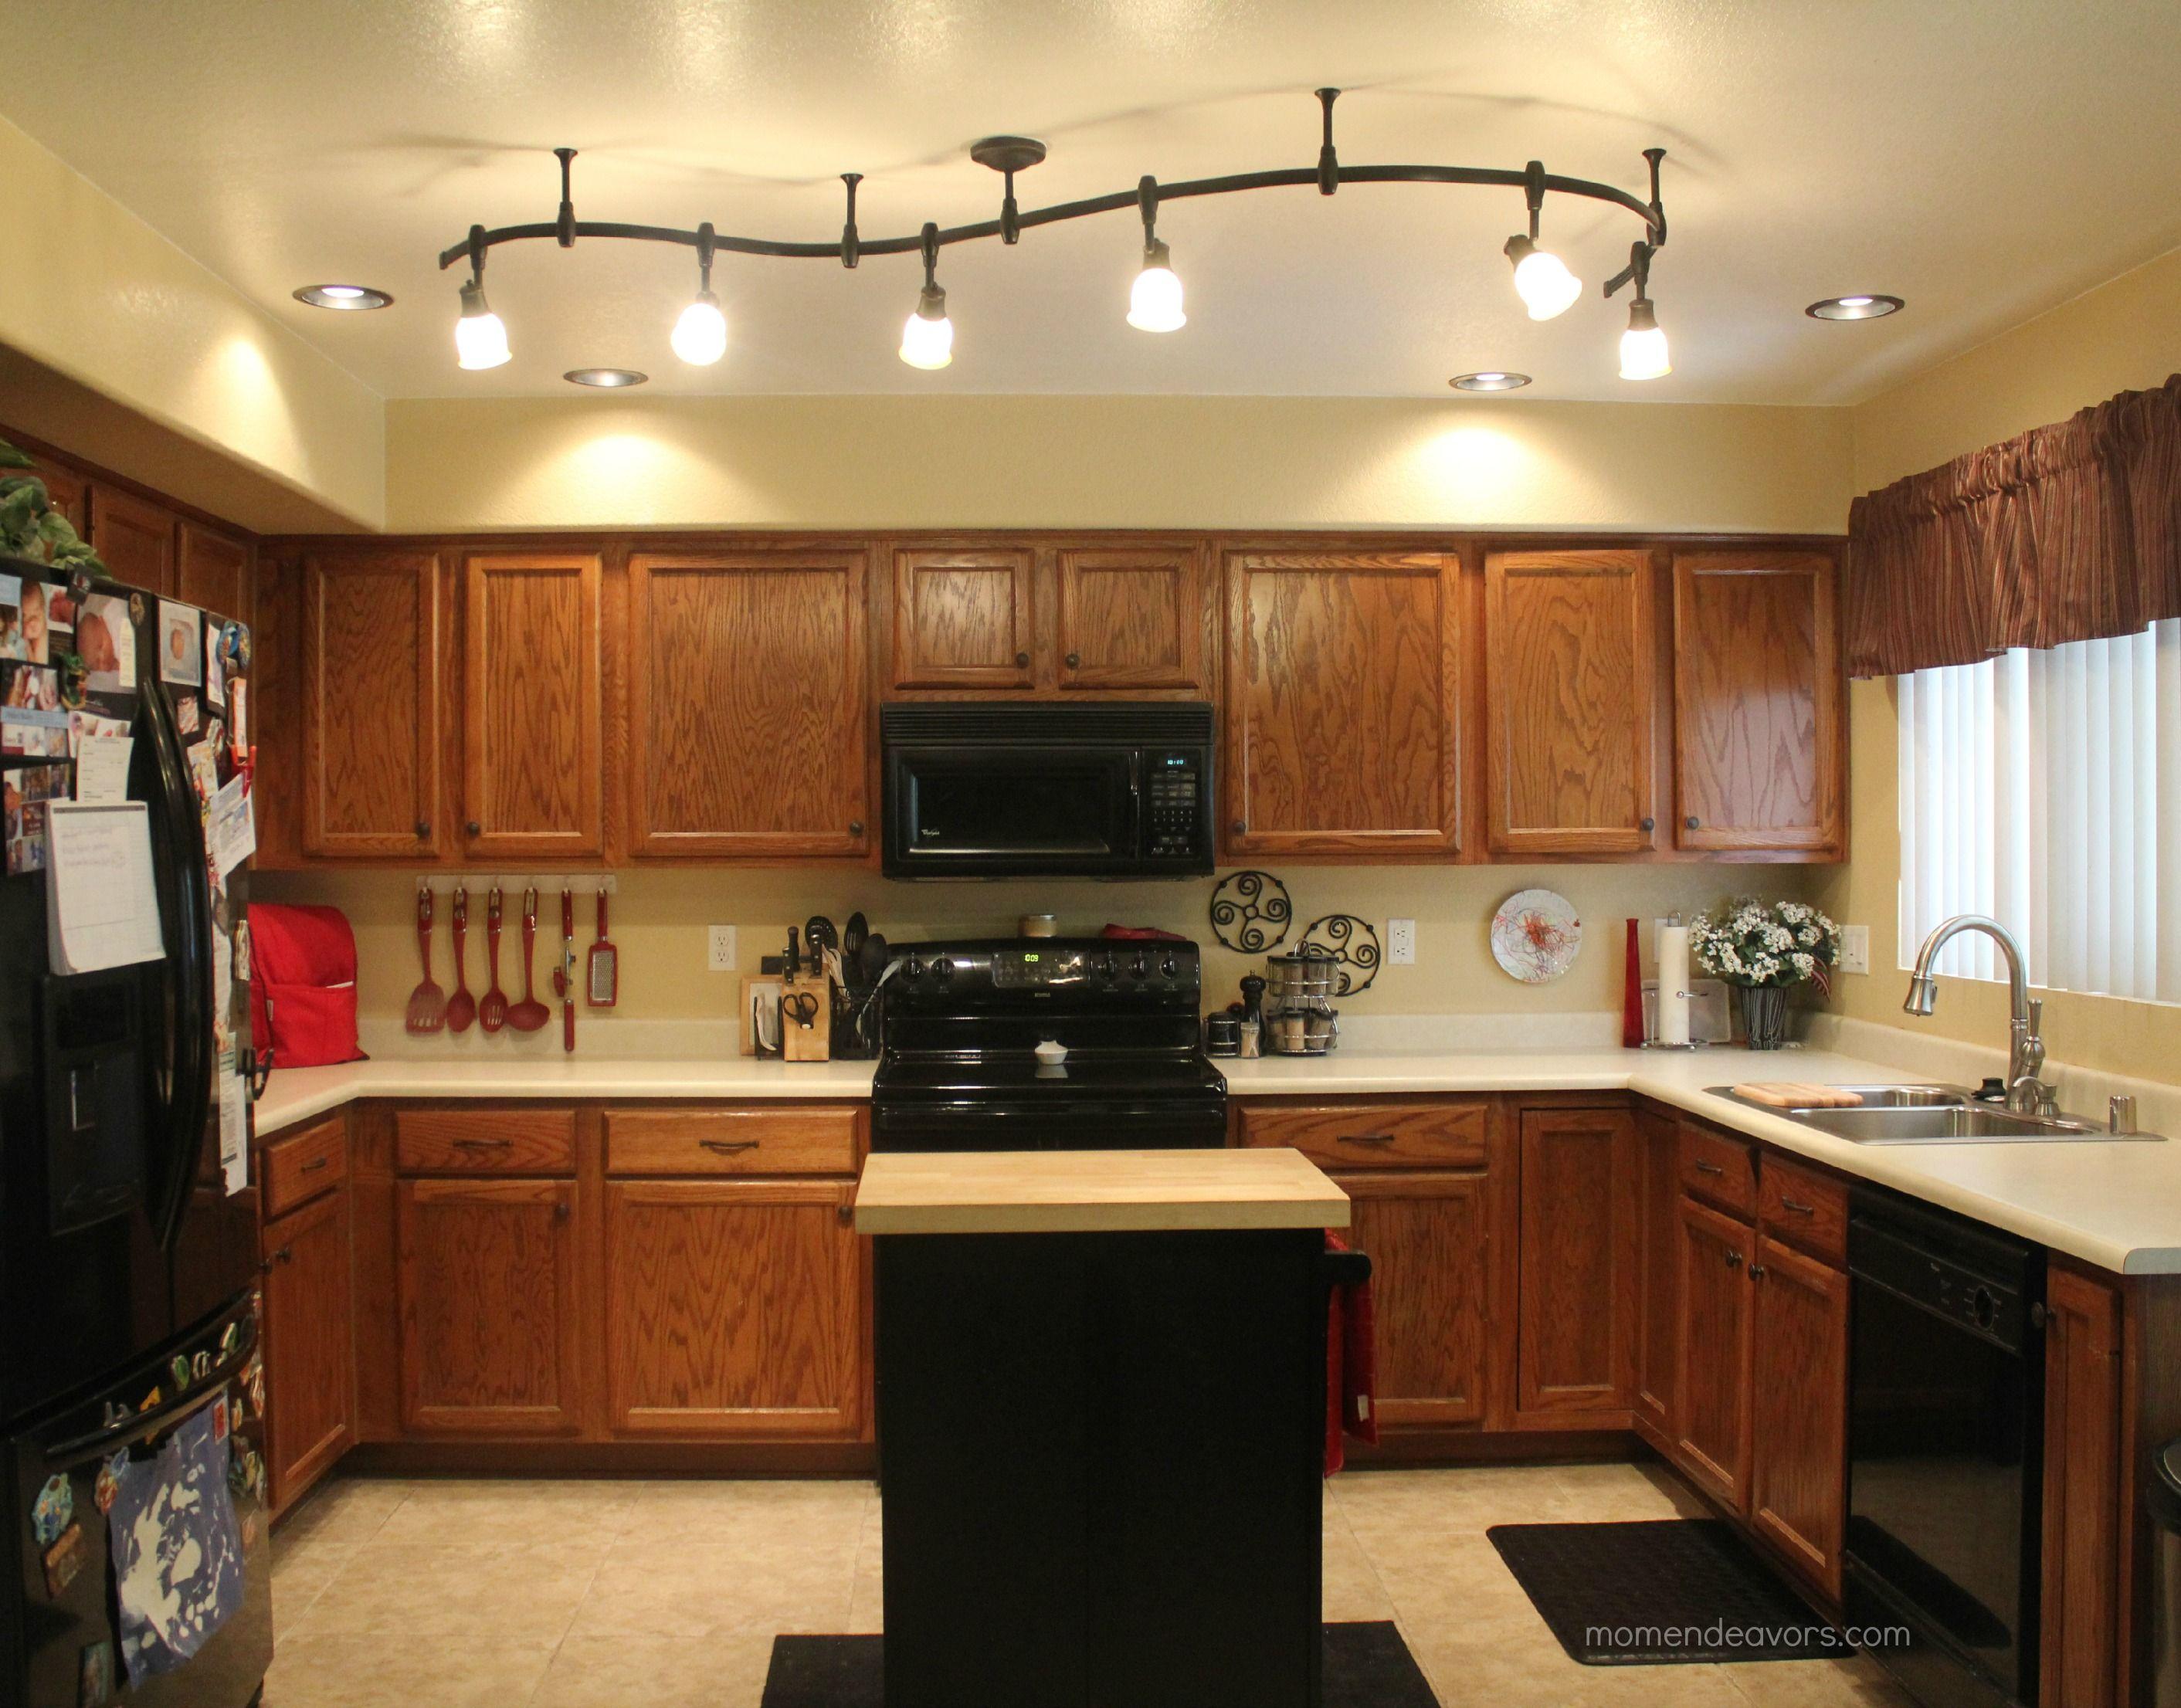 led track lighting kitchen under